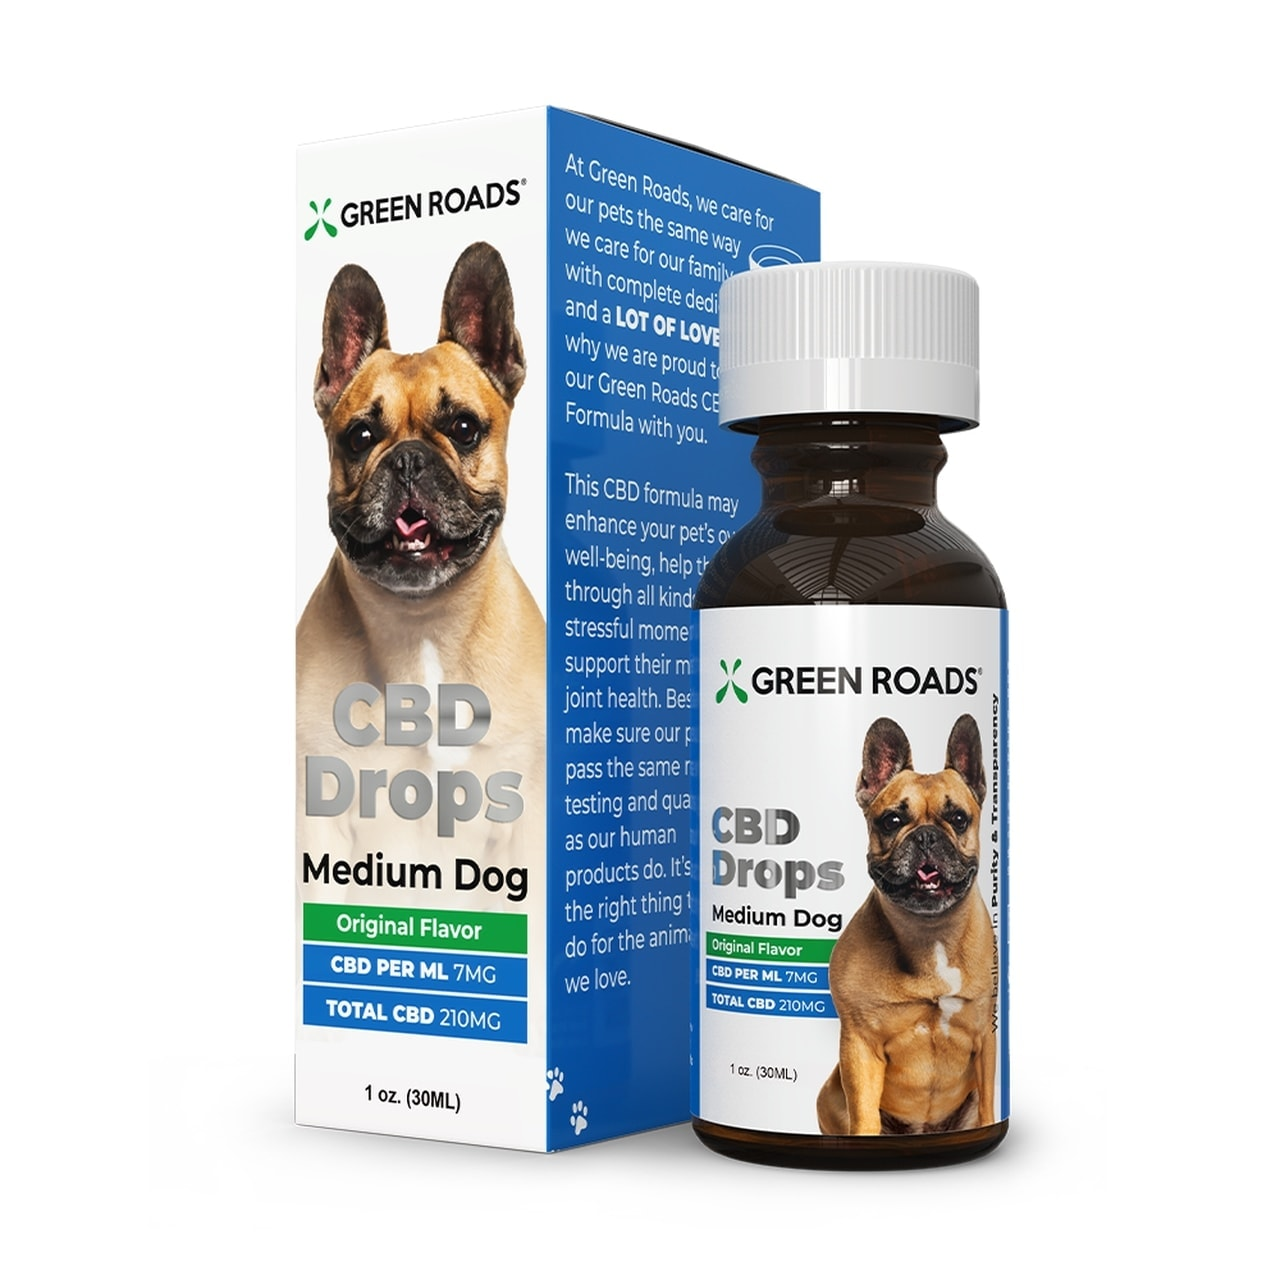 Green Roads, Pet CBD Oil Drops Medium Dog, Broad Spectrum THC-Free, 1oz, 210mg of CBD